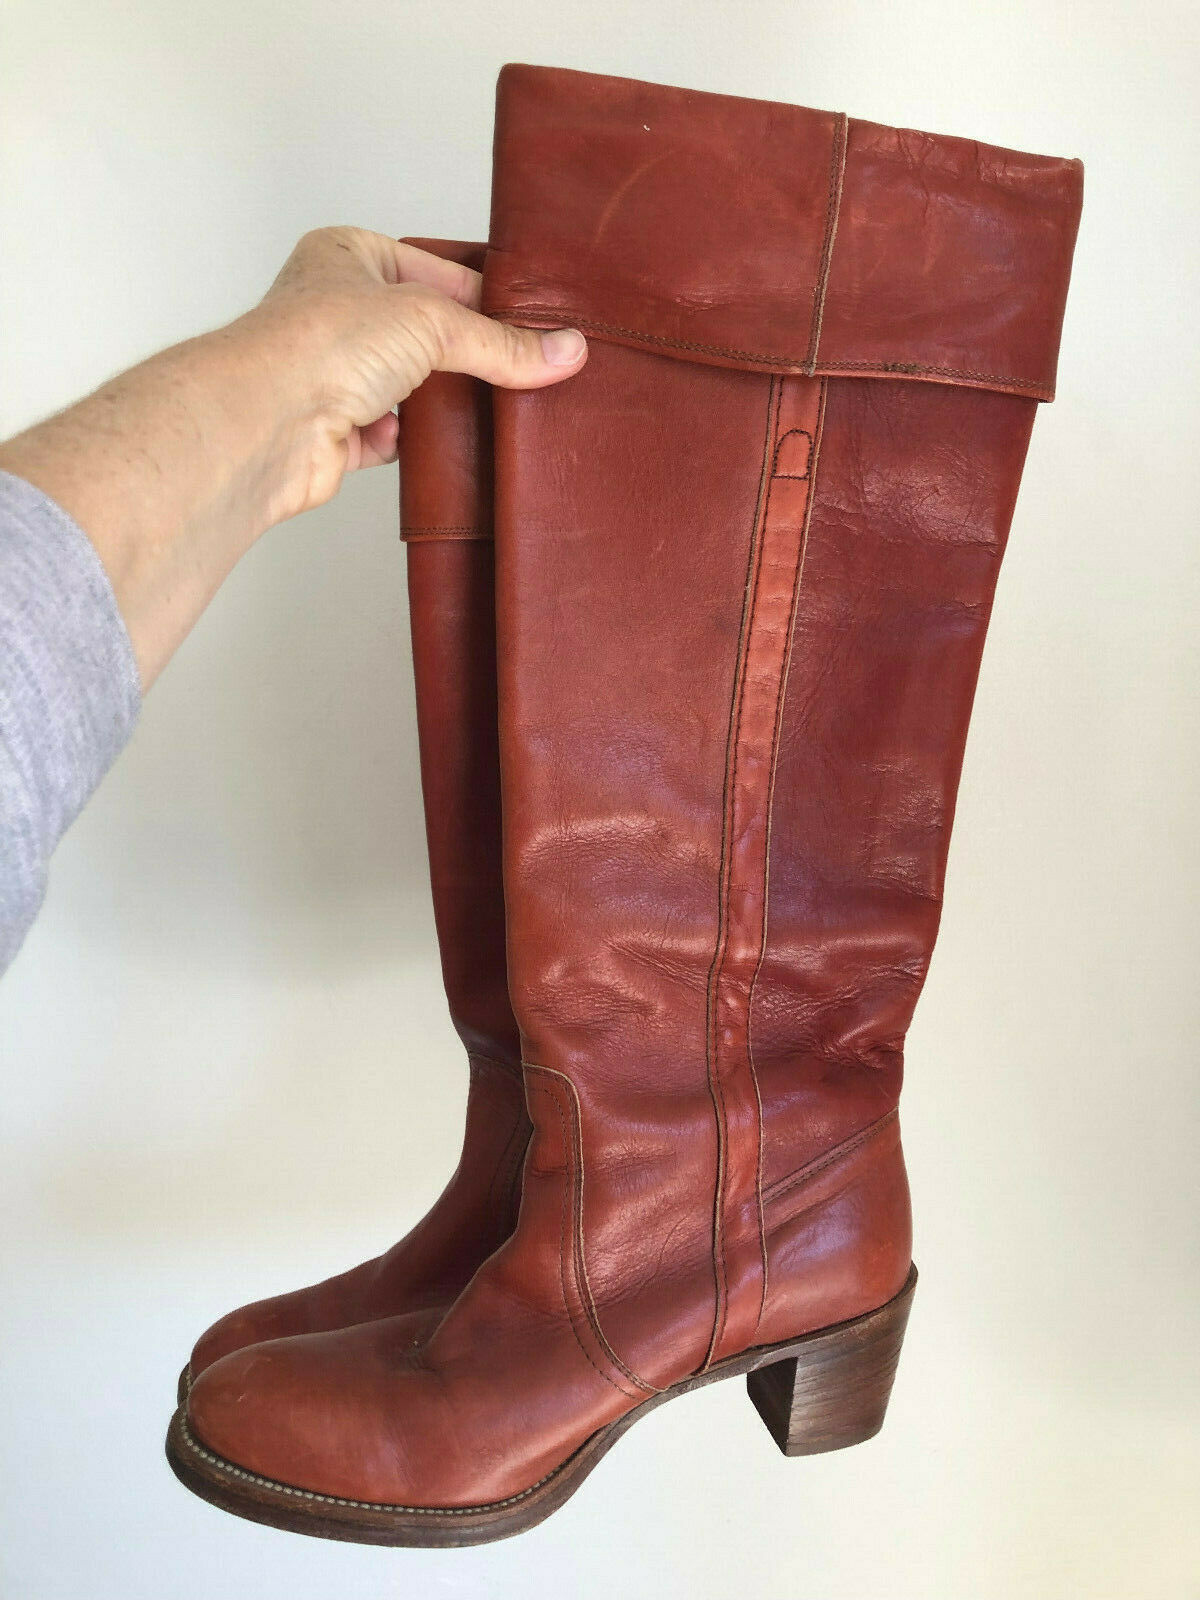 Womens VTG Frye 70s Hippy Boots Size 9 B